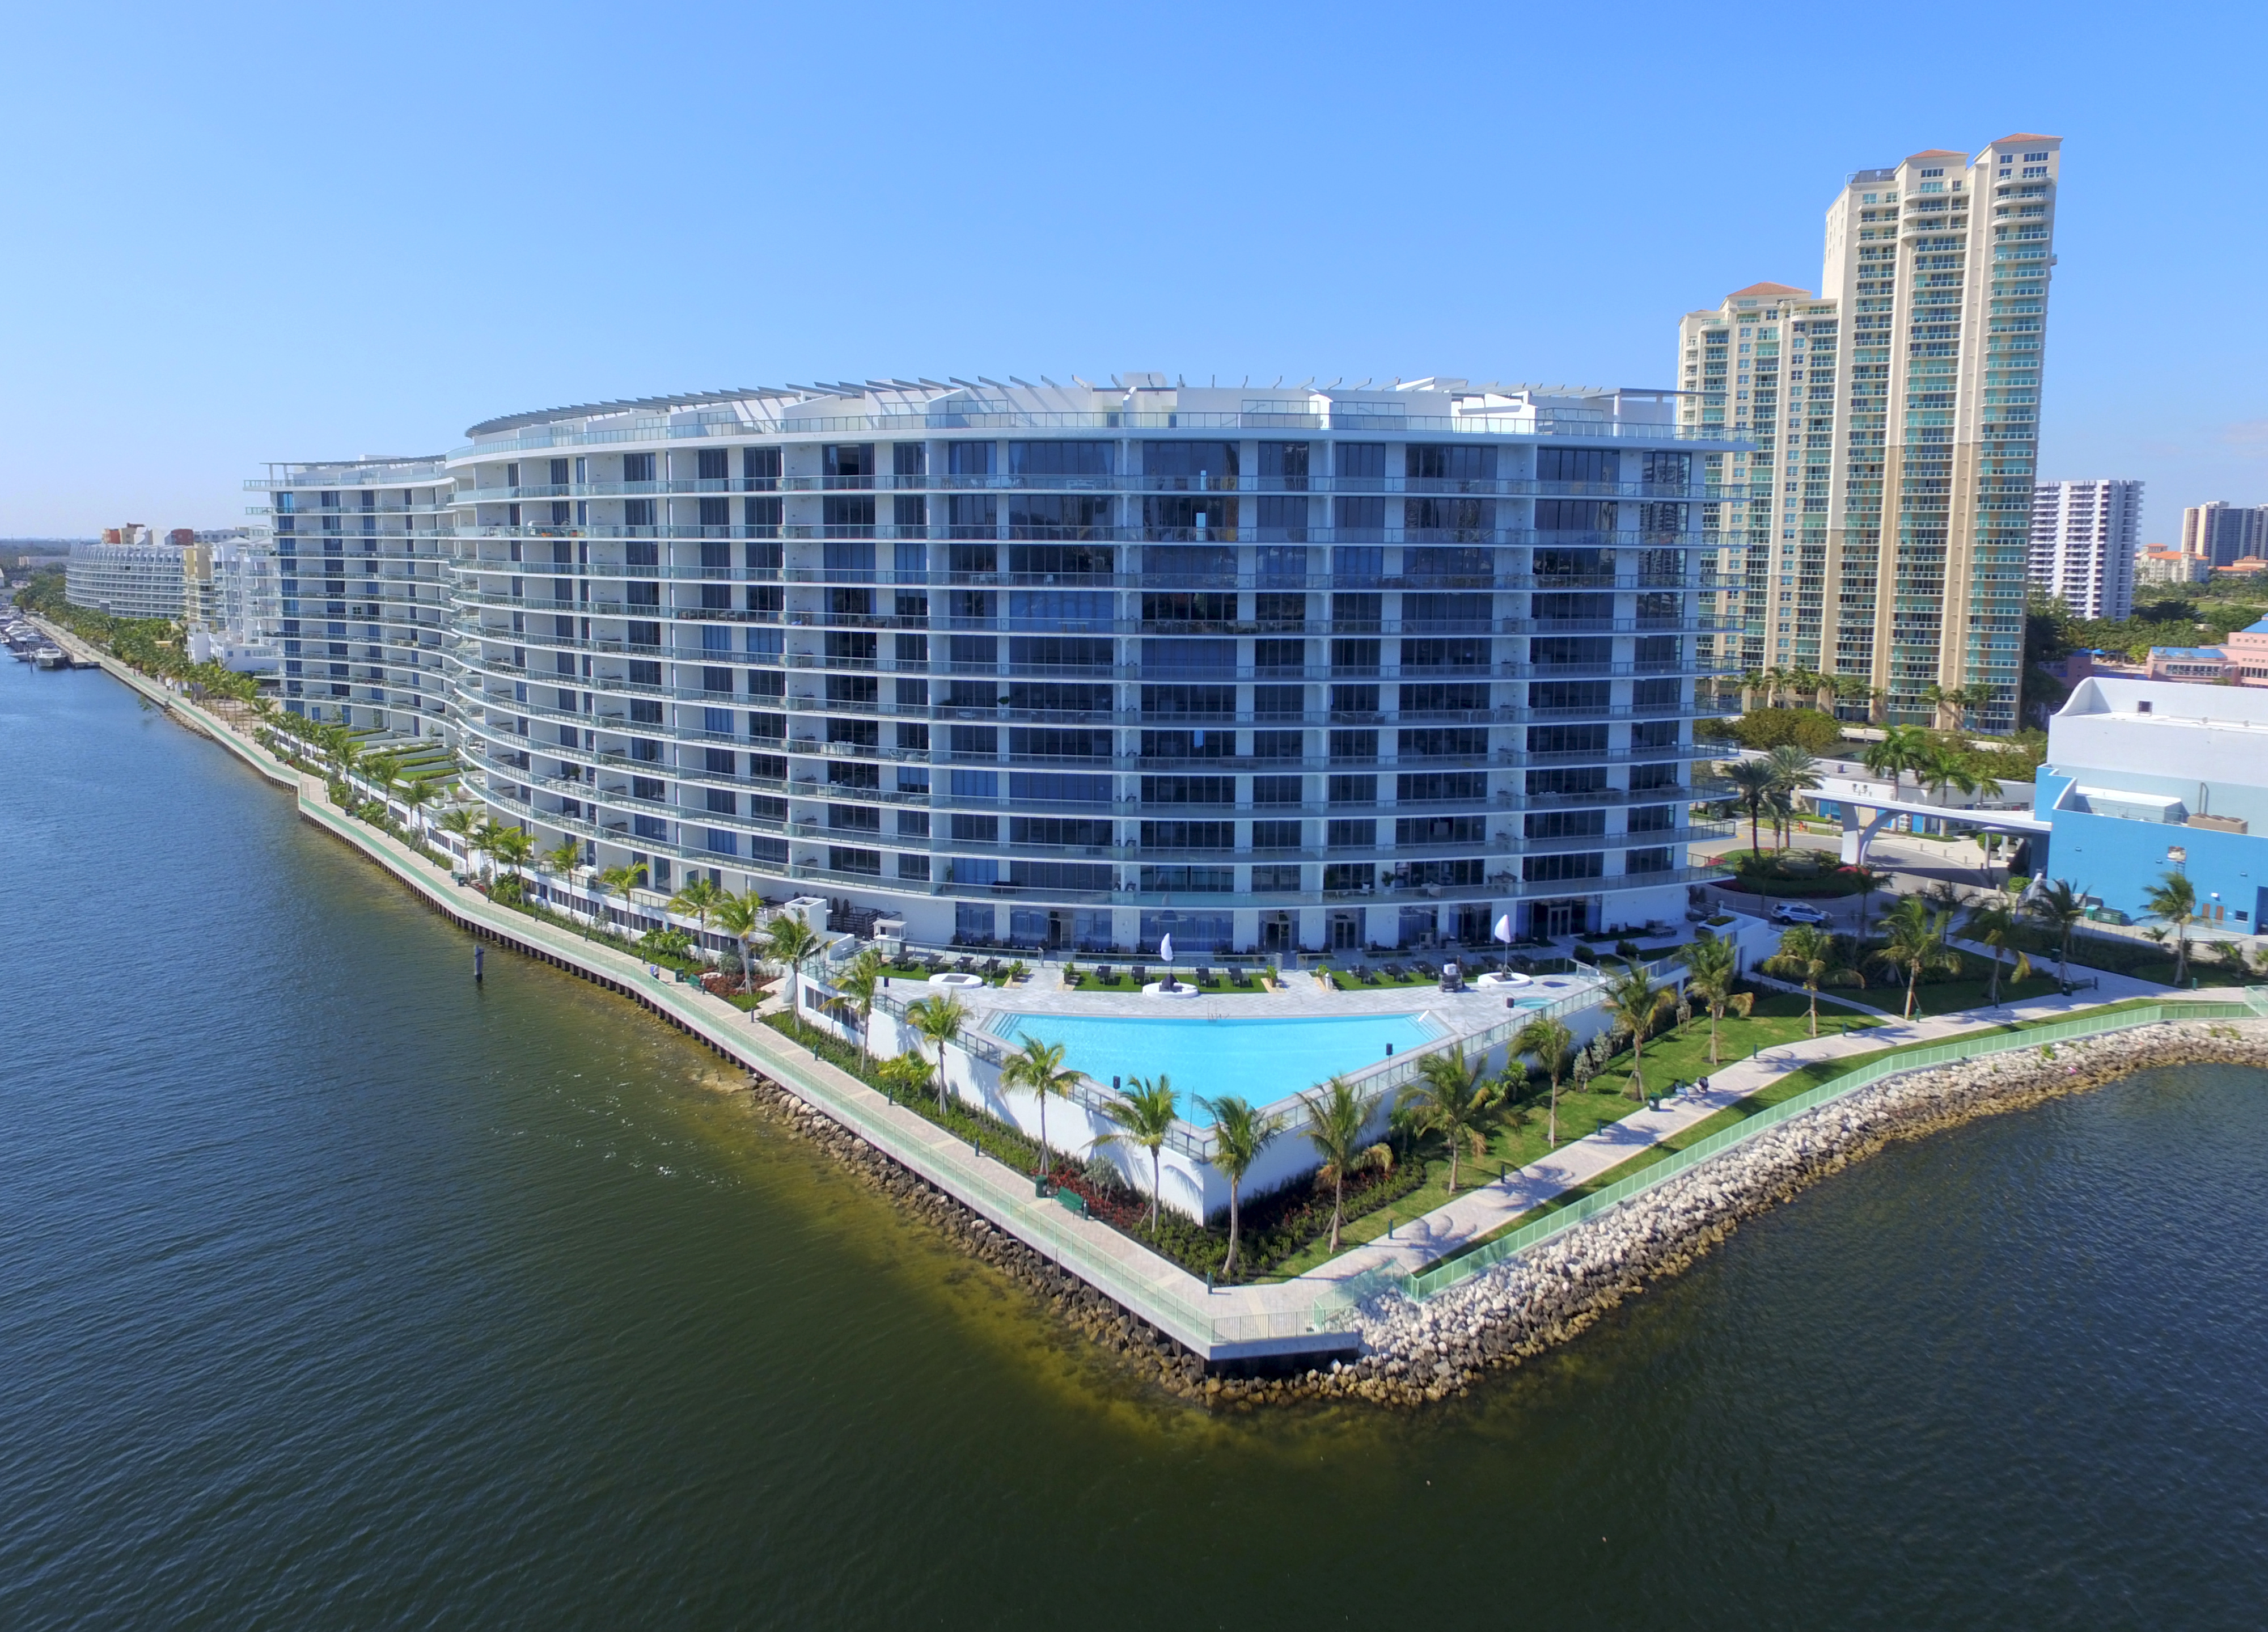 Condomínio para Venda às 3250 Ne 188th St #603 3250 Ne 188th St 603 Aventura, Florida, 33180 Estados Unidos